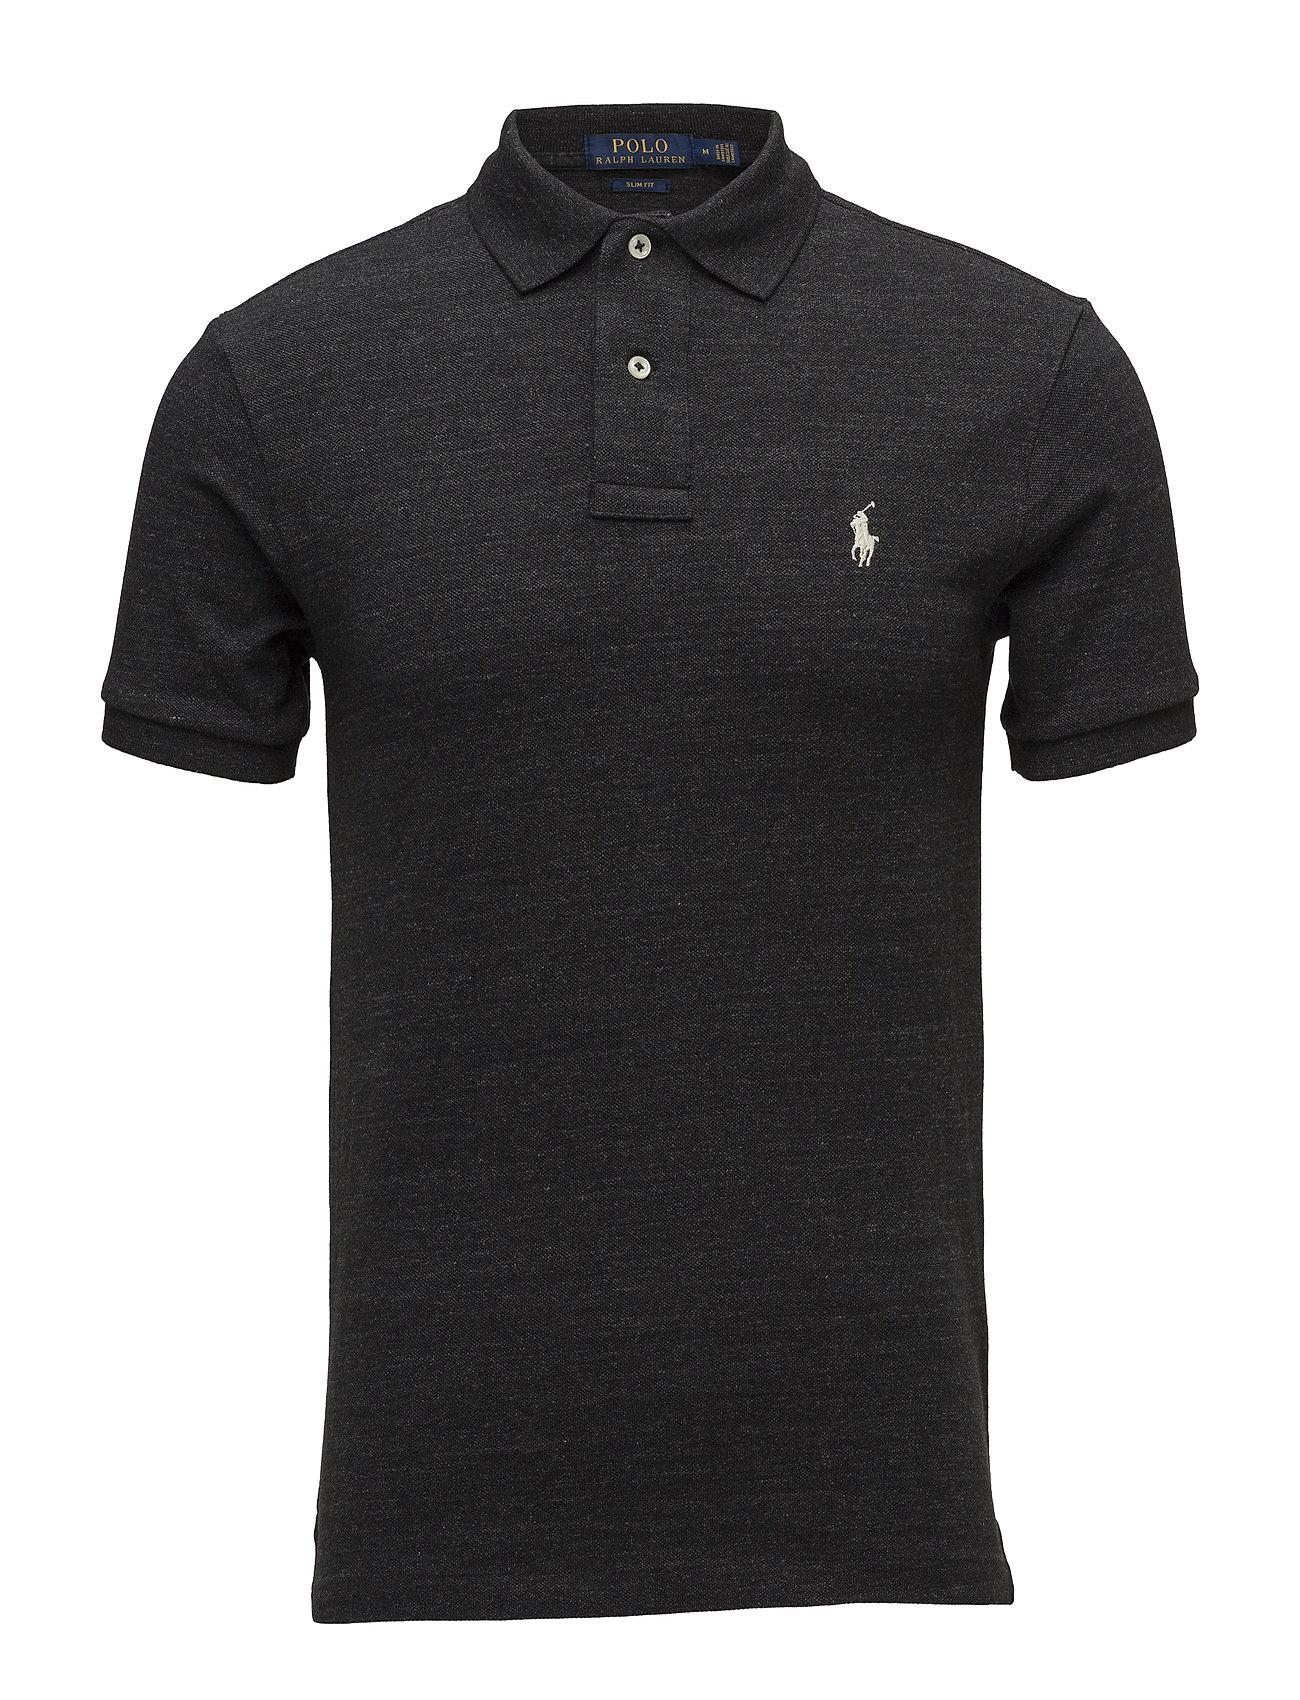 Polo Ralph Lauren Slim Fit Mesh Polo Shirt - BLACK COAL HEAT